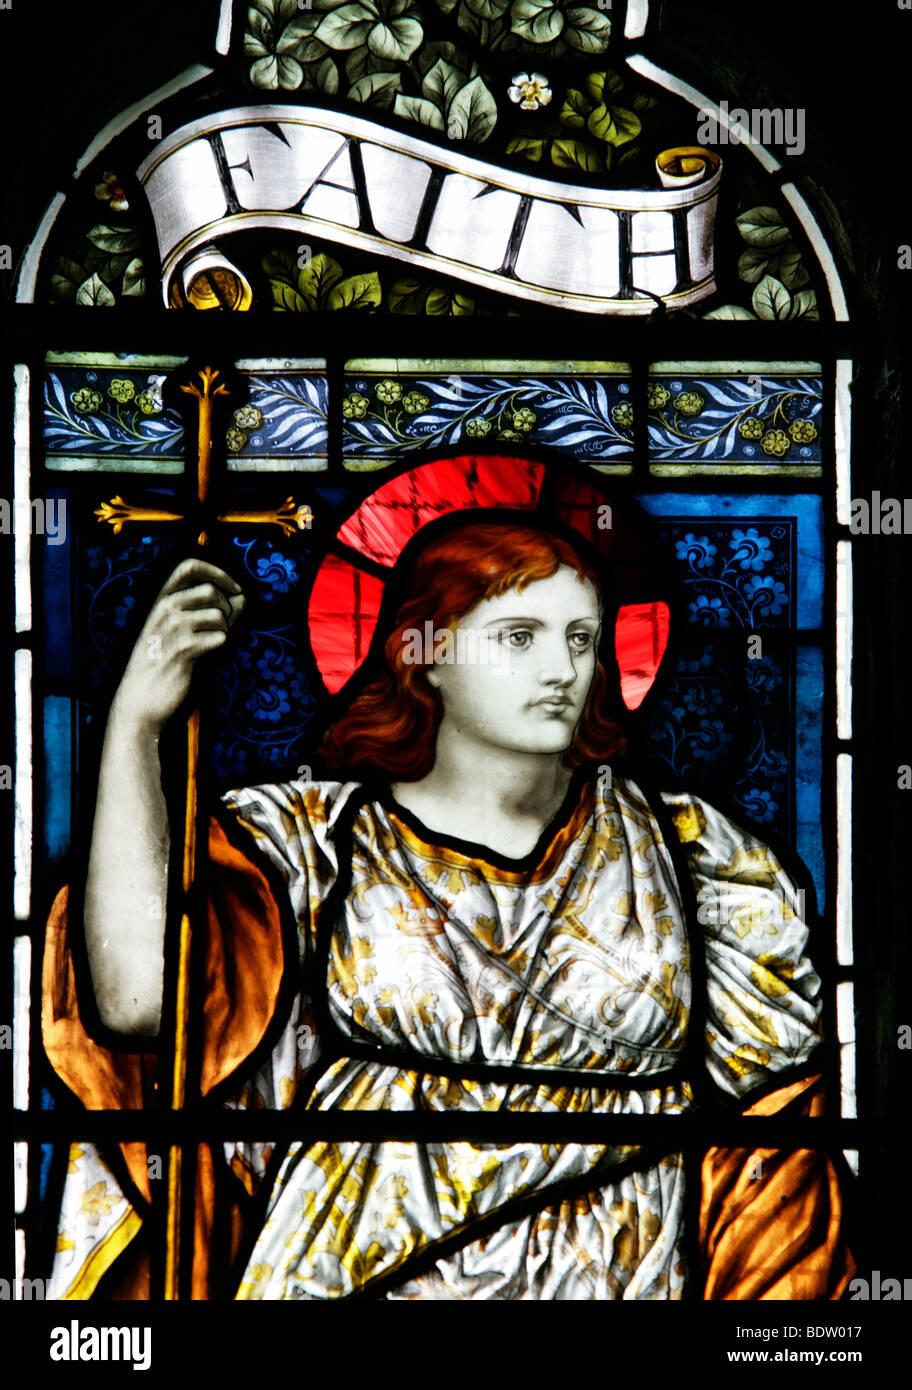 Glasmalerei-Fenster Darstellung glauben, Kirche Tintagel, Cornwall Stockbild